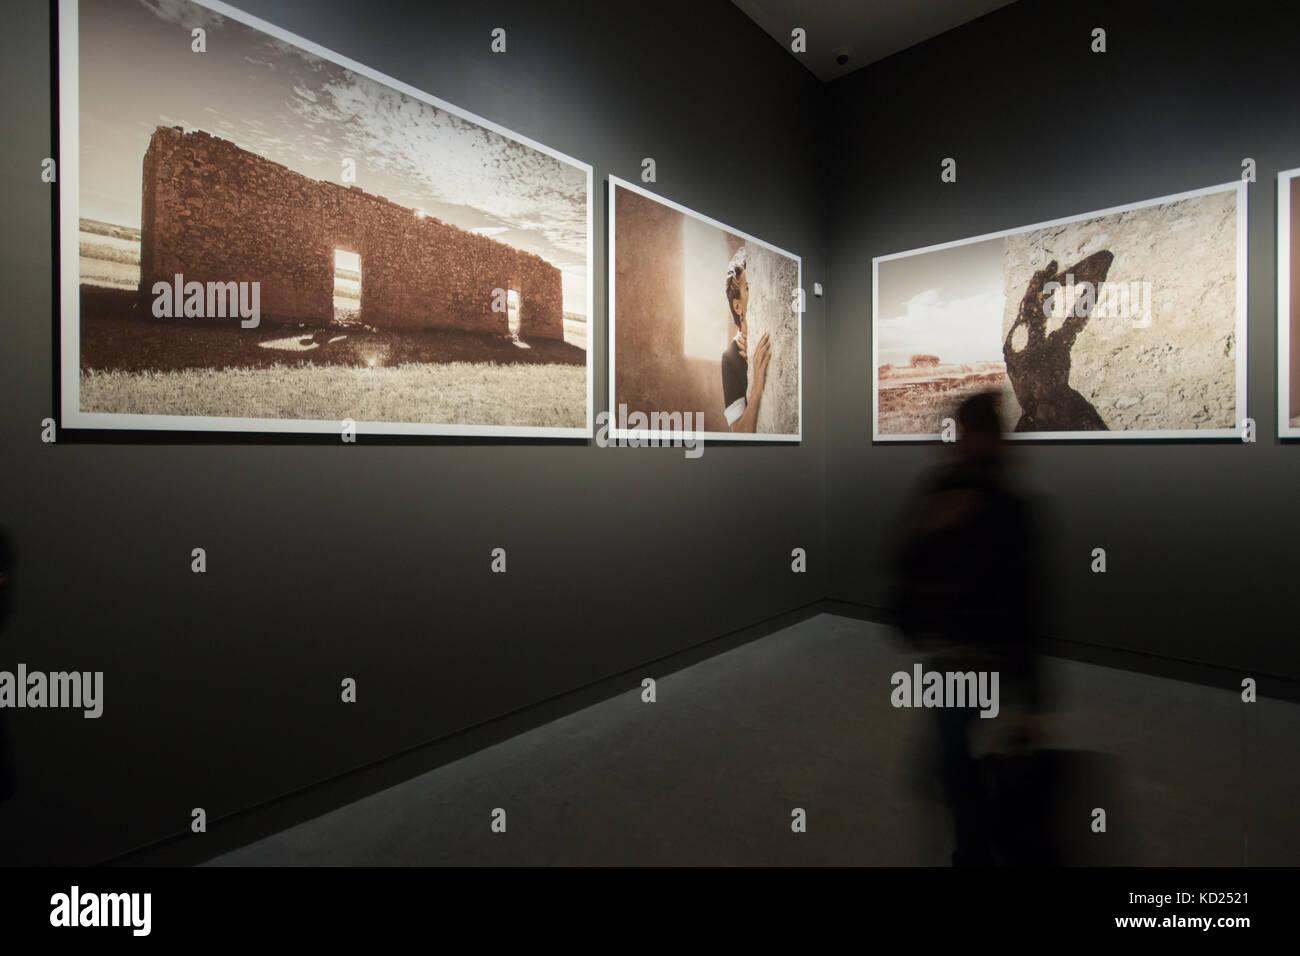 "Tracey Moffatt - photographs from the series ""Body Remembers"", My Horizon exhibition | Australian Pavilion, 57th Stock Photo"